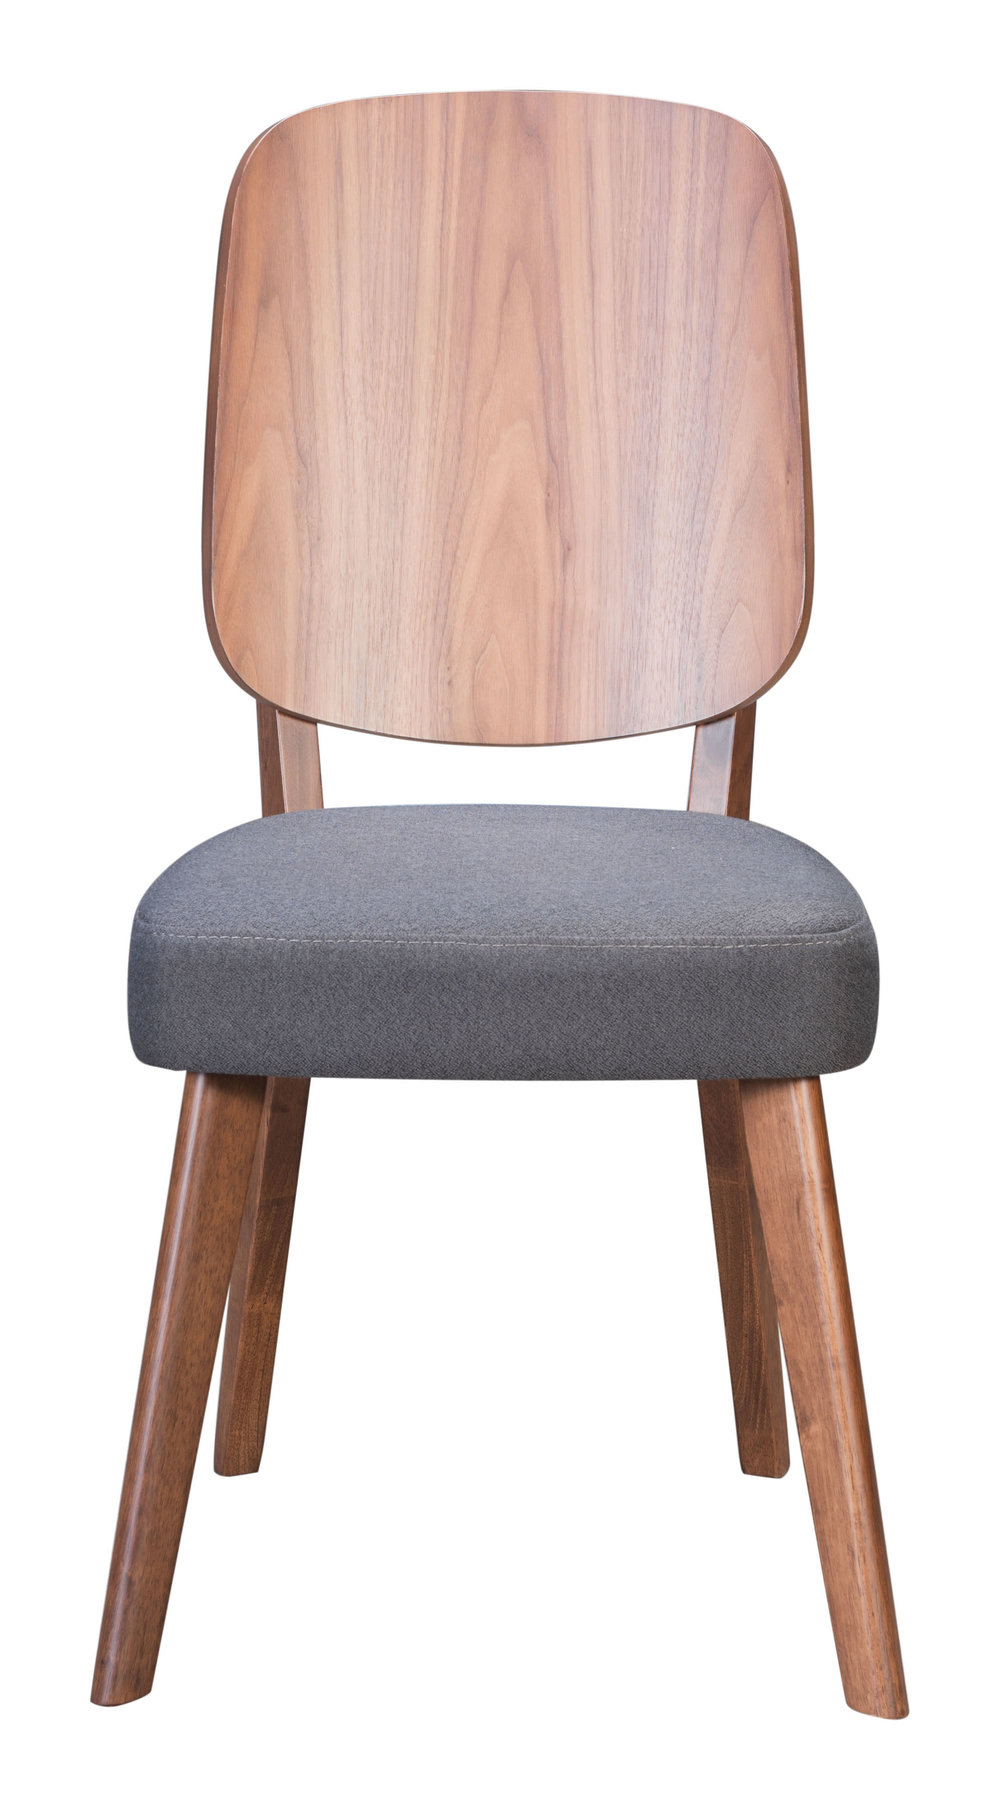 ZUO MODERN CONTEMPORARY, INC - Alberta Dining Chair - Set of 2 - Walnut & Dark Gray